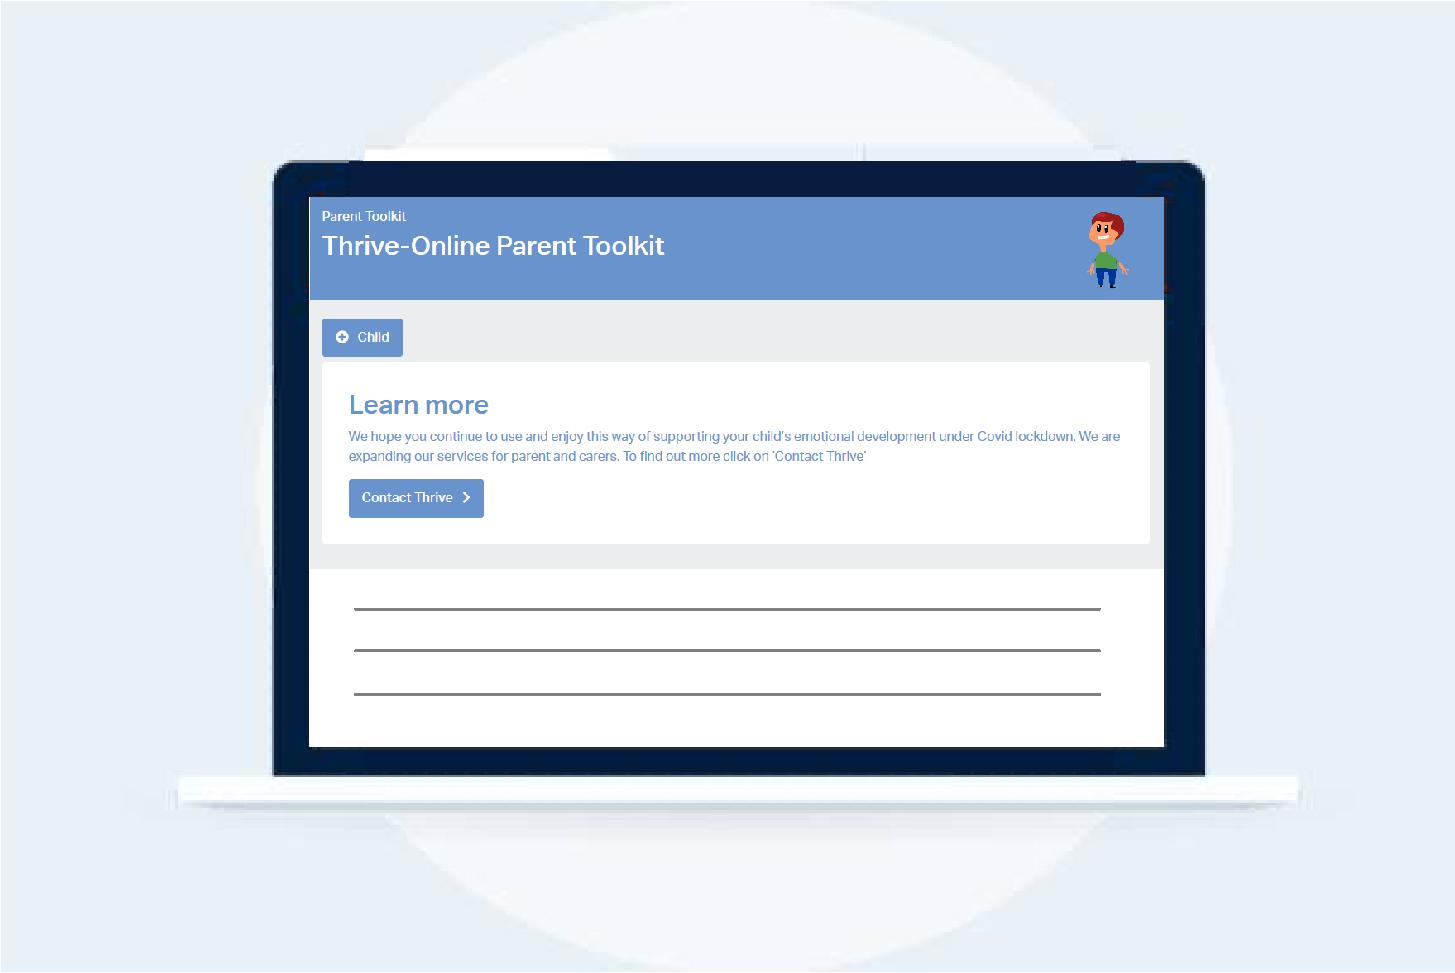 Thrive-Online Parent Toolkit